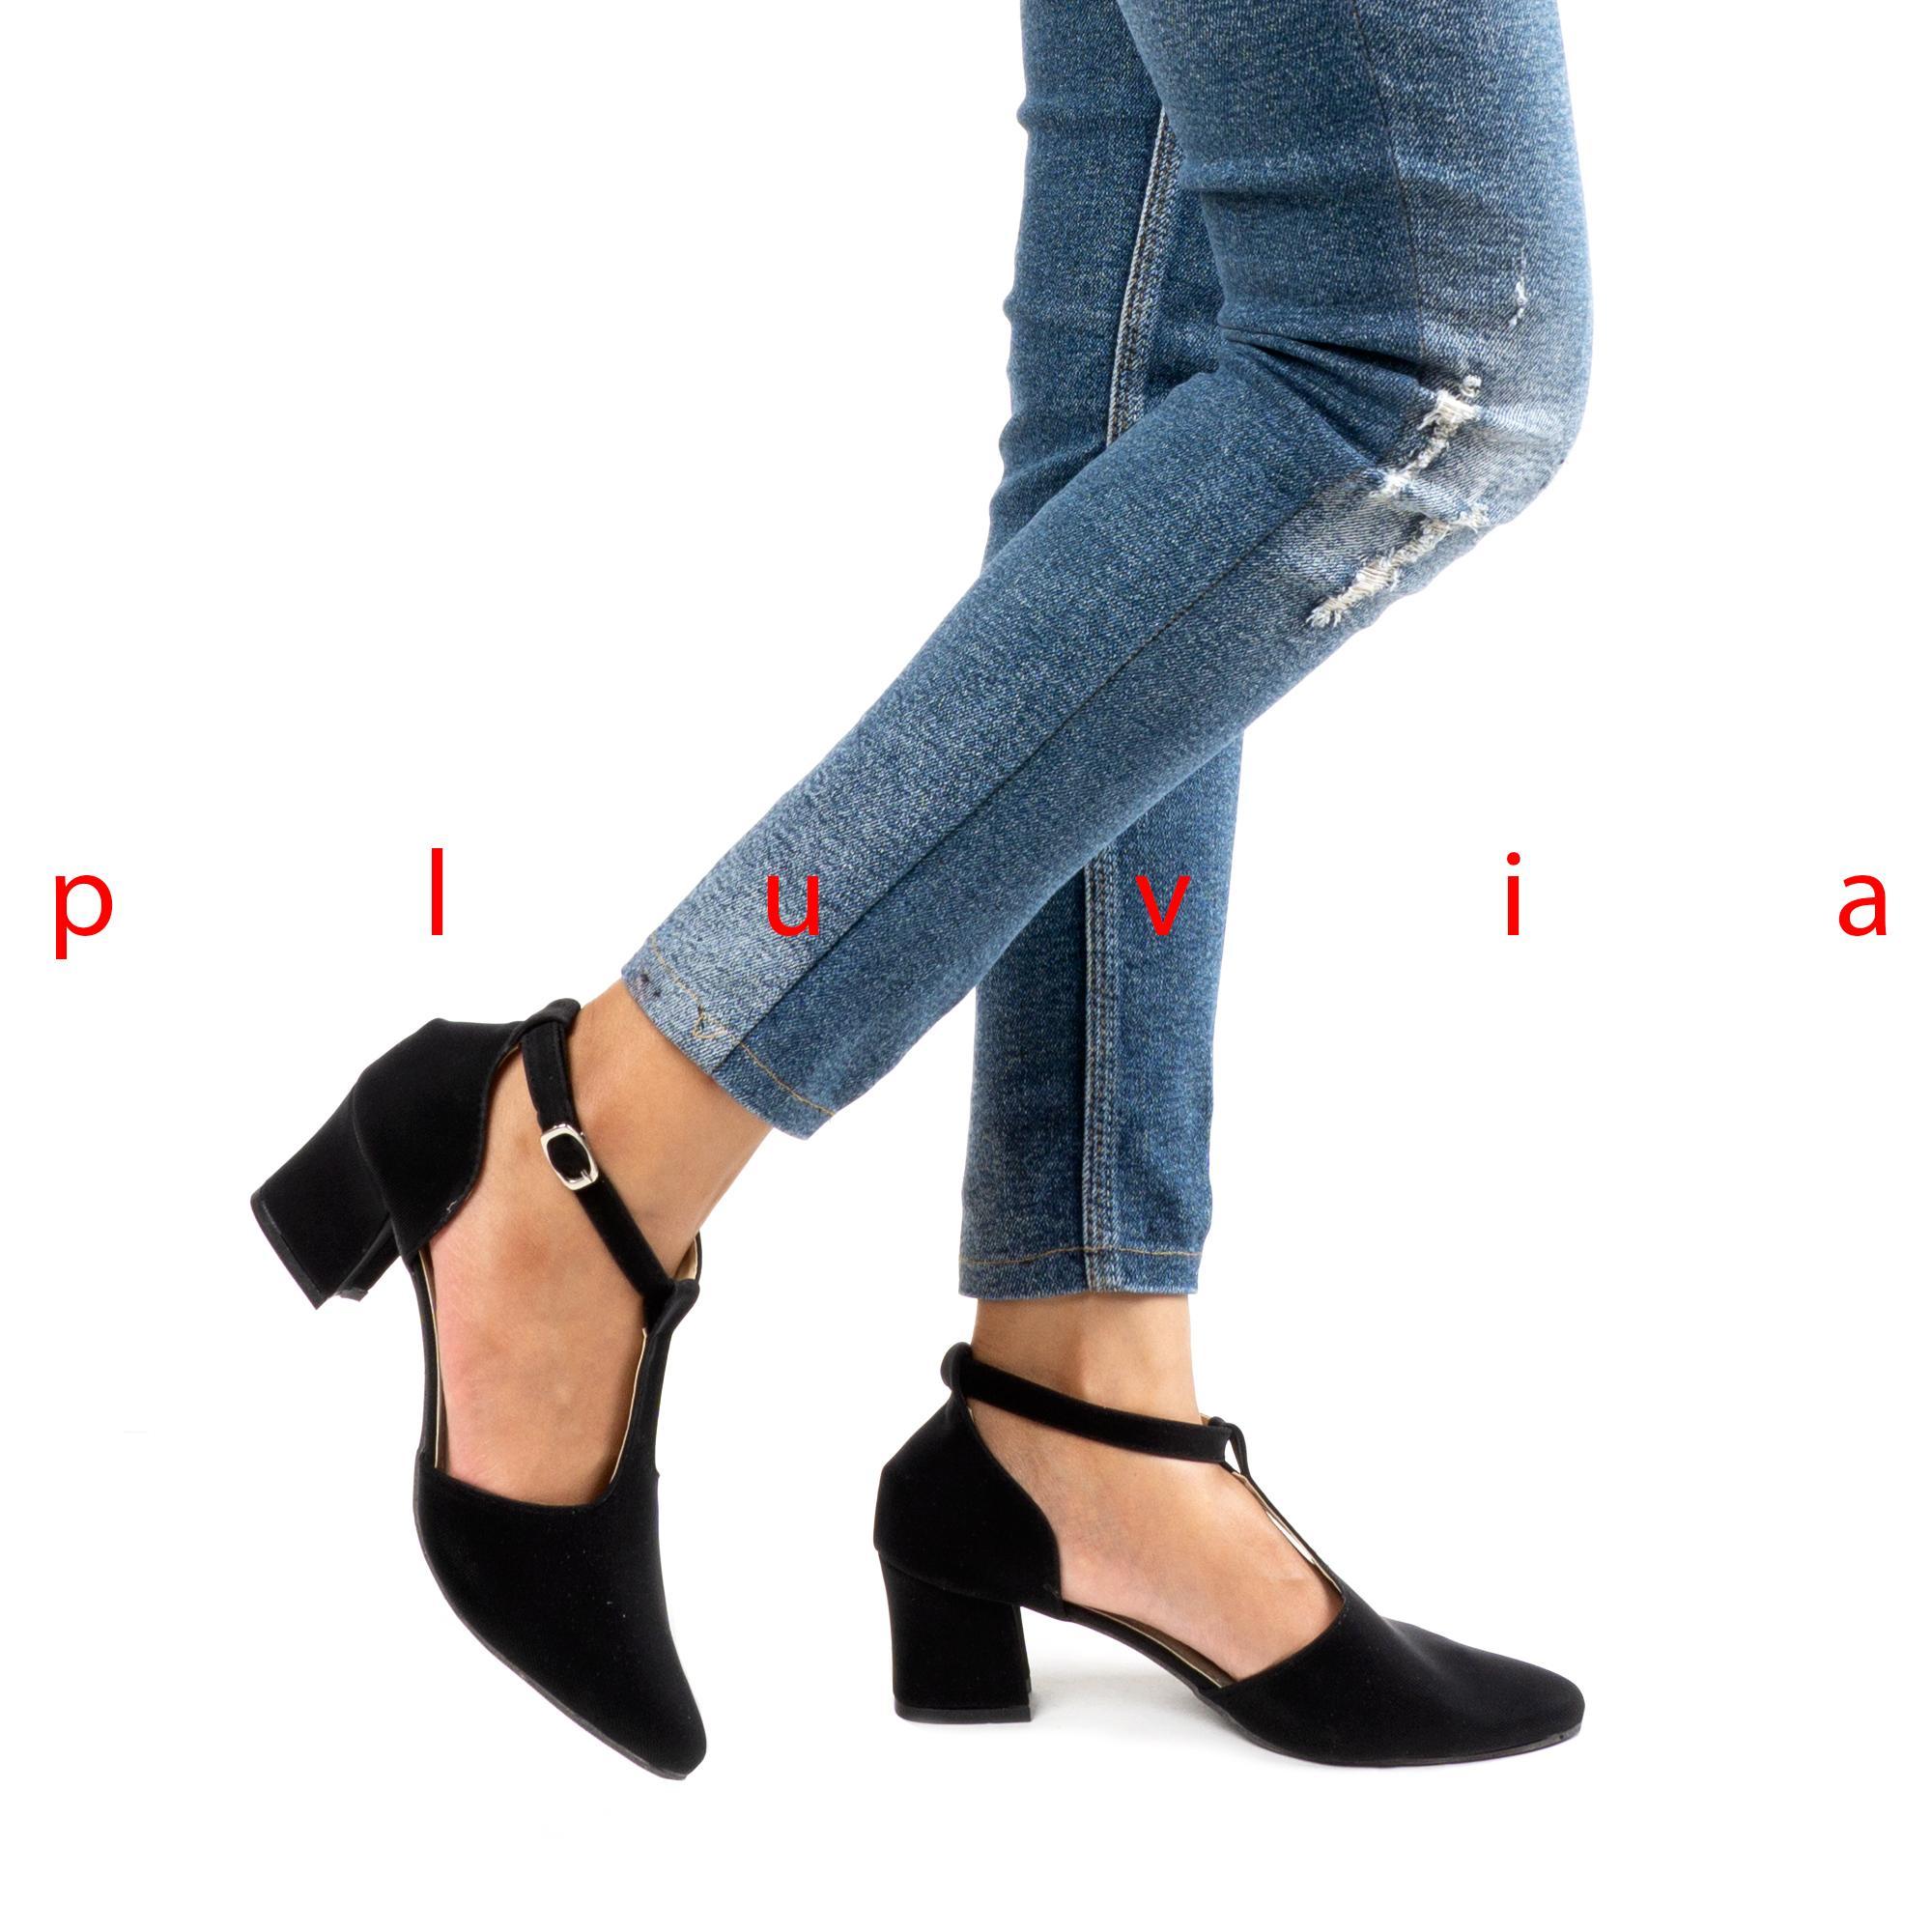 Pluvia - Sepatu Pantofel High Heels T-Strap Wanita CH02 - Hitam